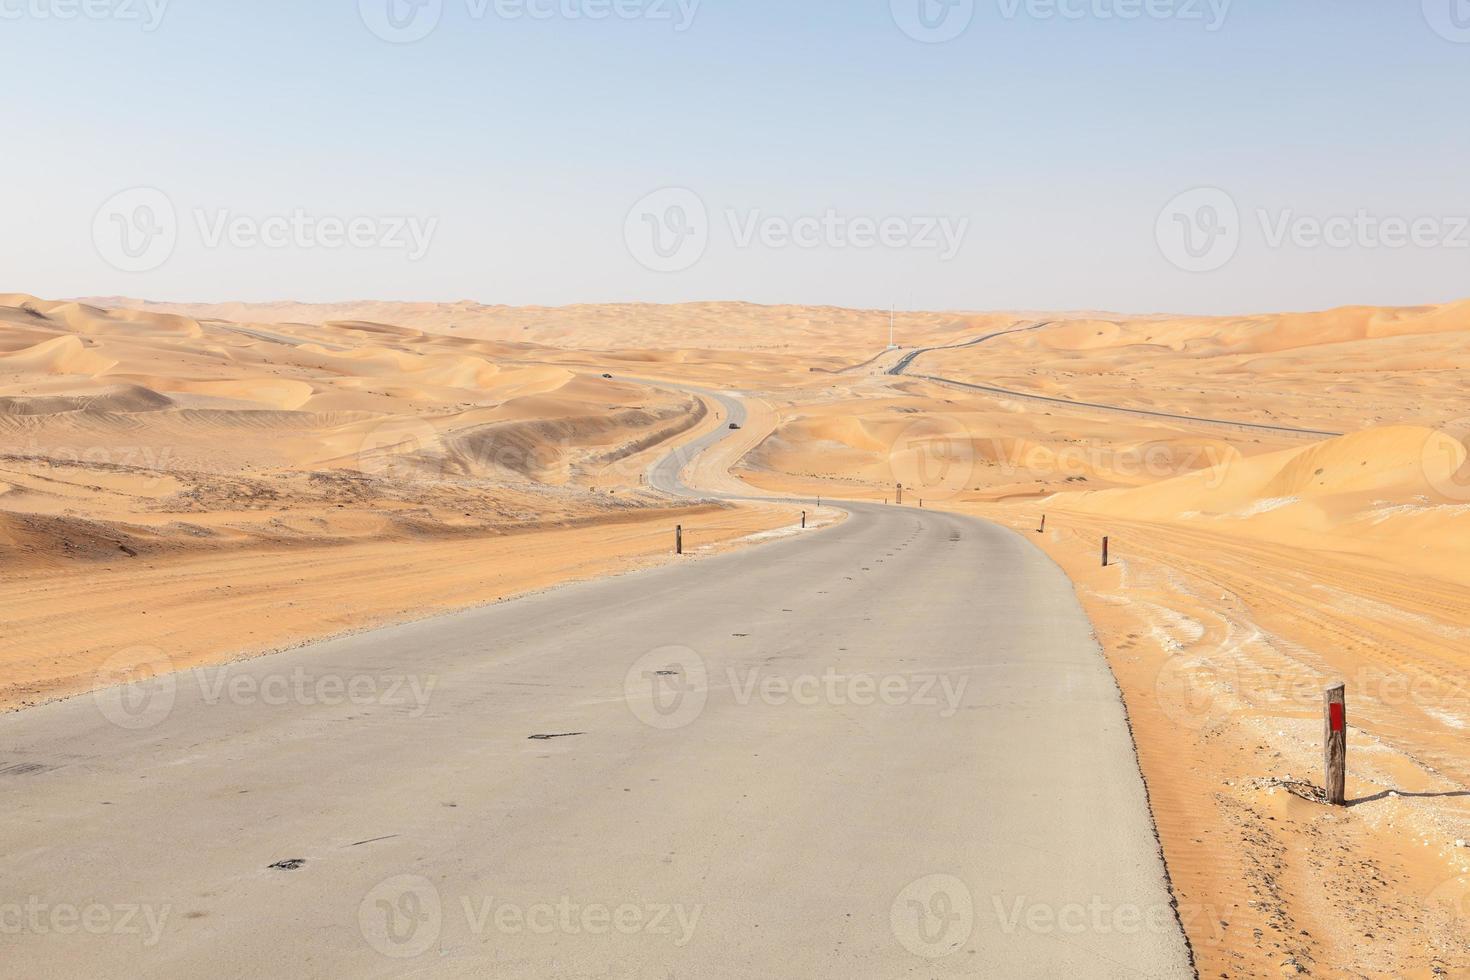 Wüstenresort foto